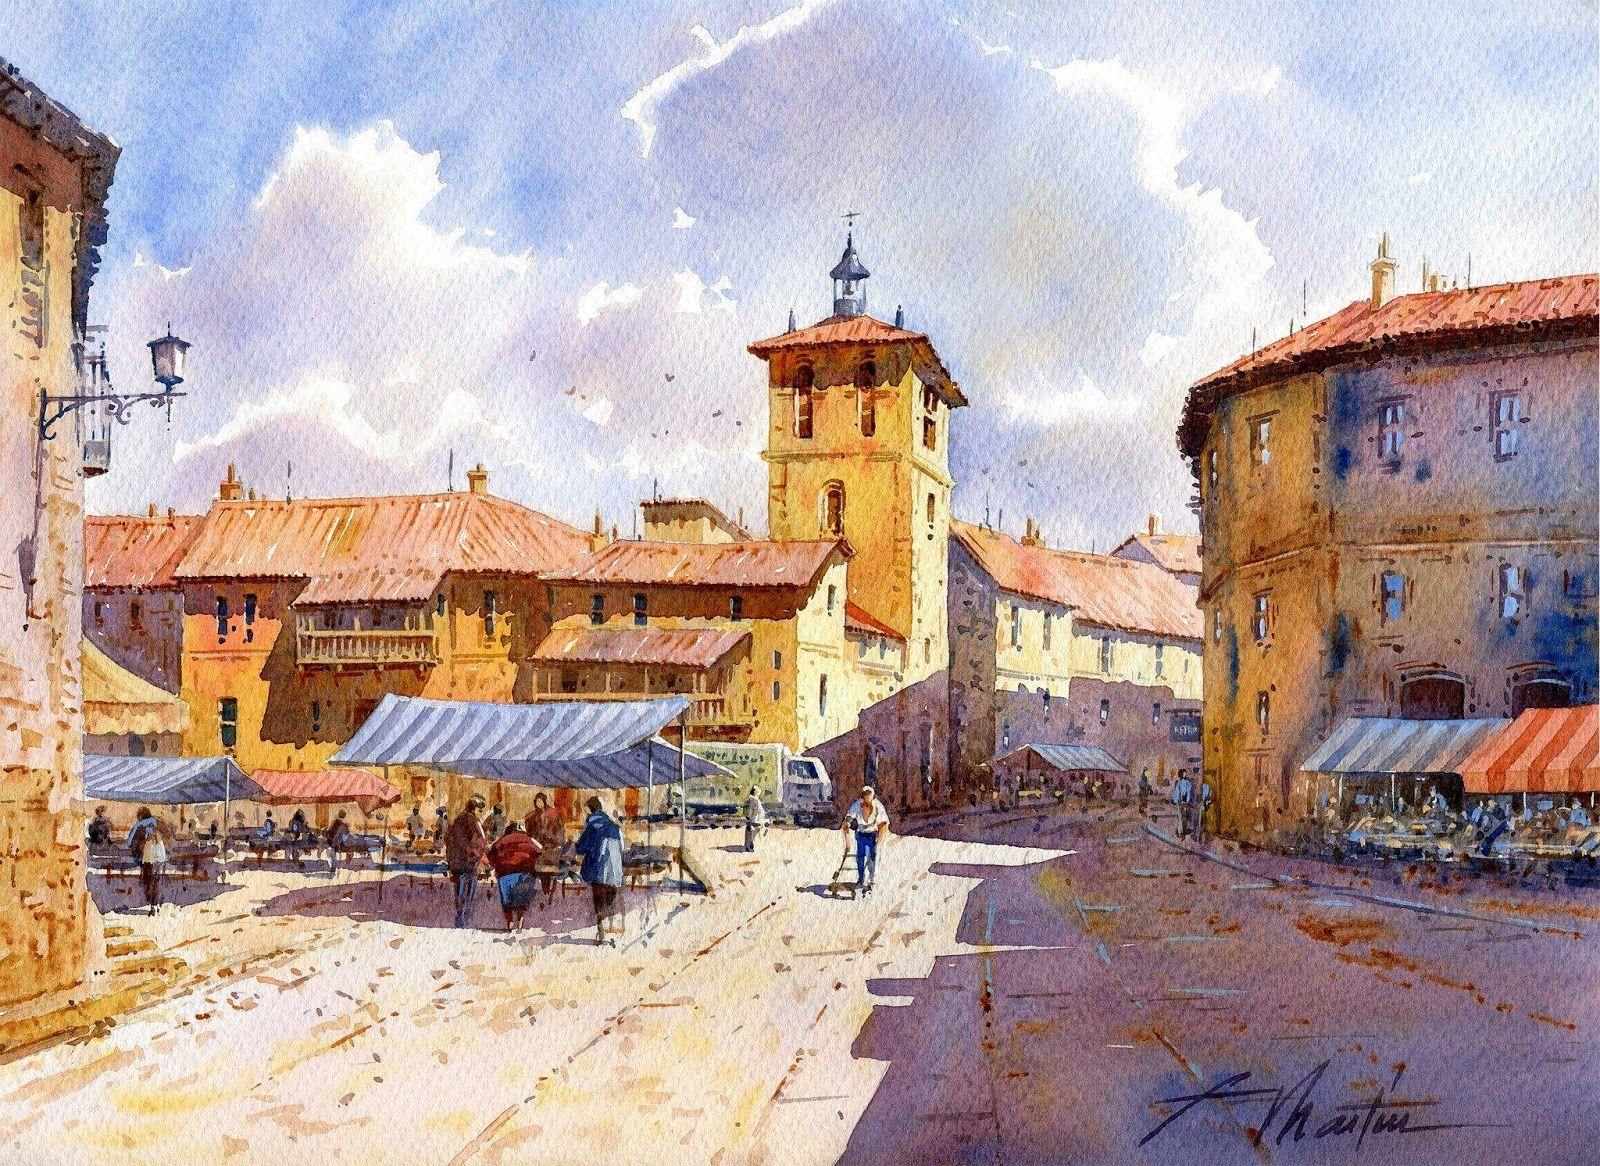 Watercolor artist magazine customer service - Arts Artist Faustino Martin Gonzalez